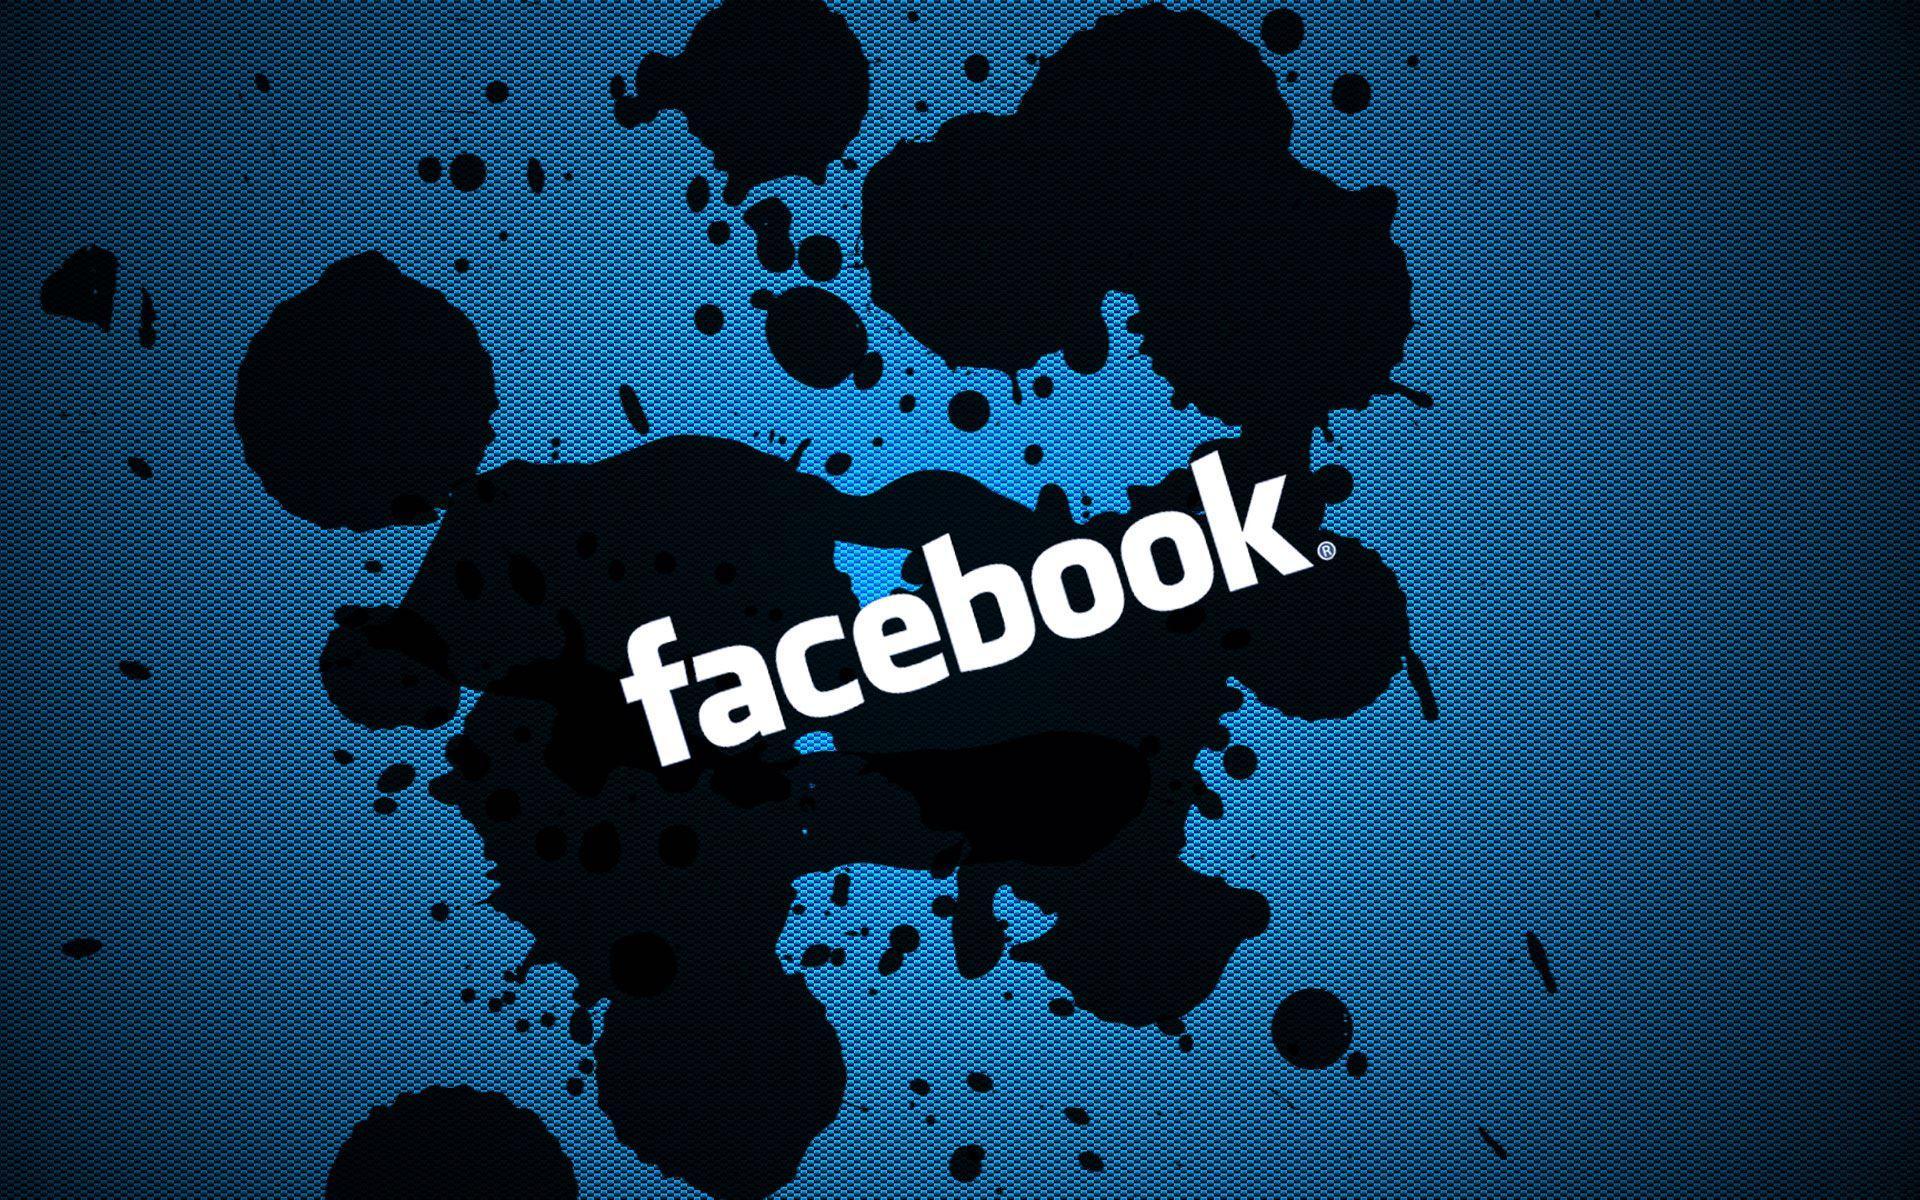 Facebook Profile Wallpaper Picture Wallpapers Pic Hwb39193 - Facebook Logo , HD Wallpaper & Backgrounds